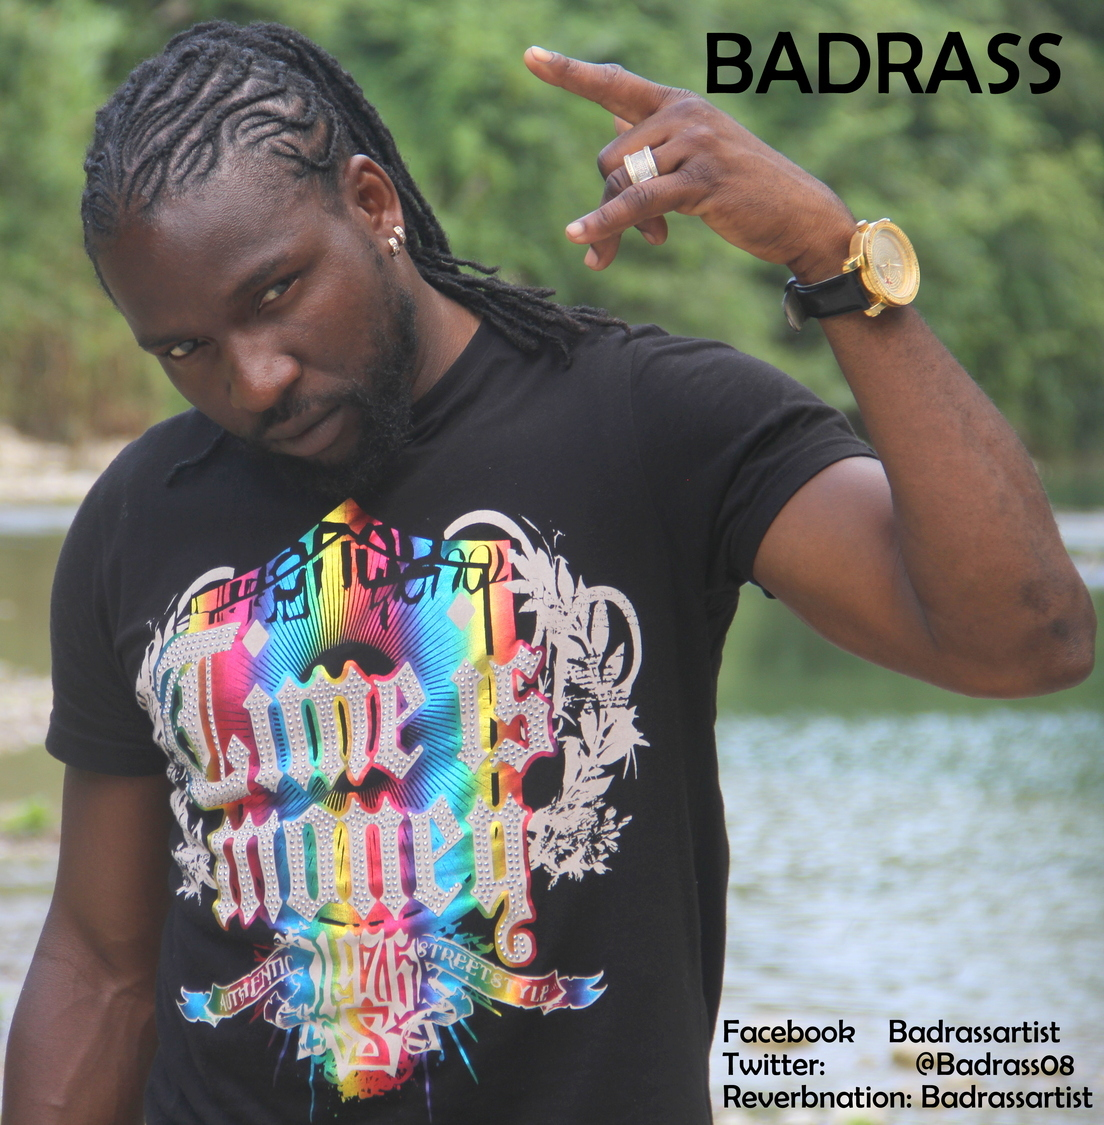 Black t shirt reverbnation - Black T Shirt Reverbnation 57